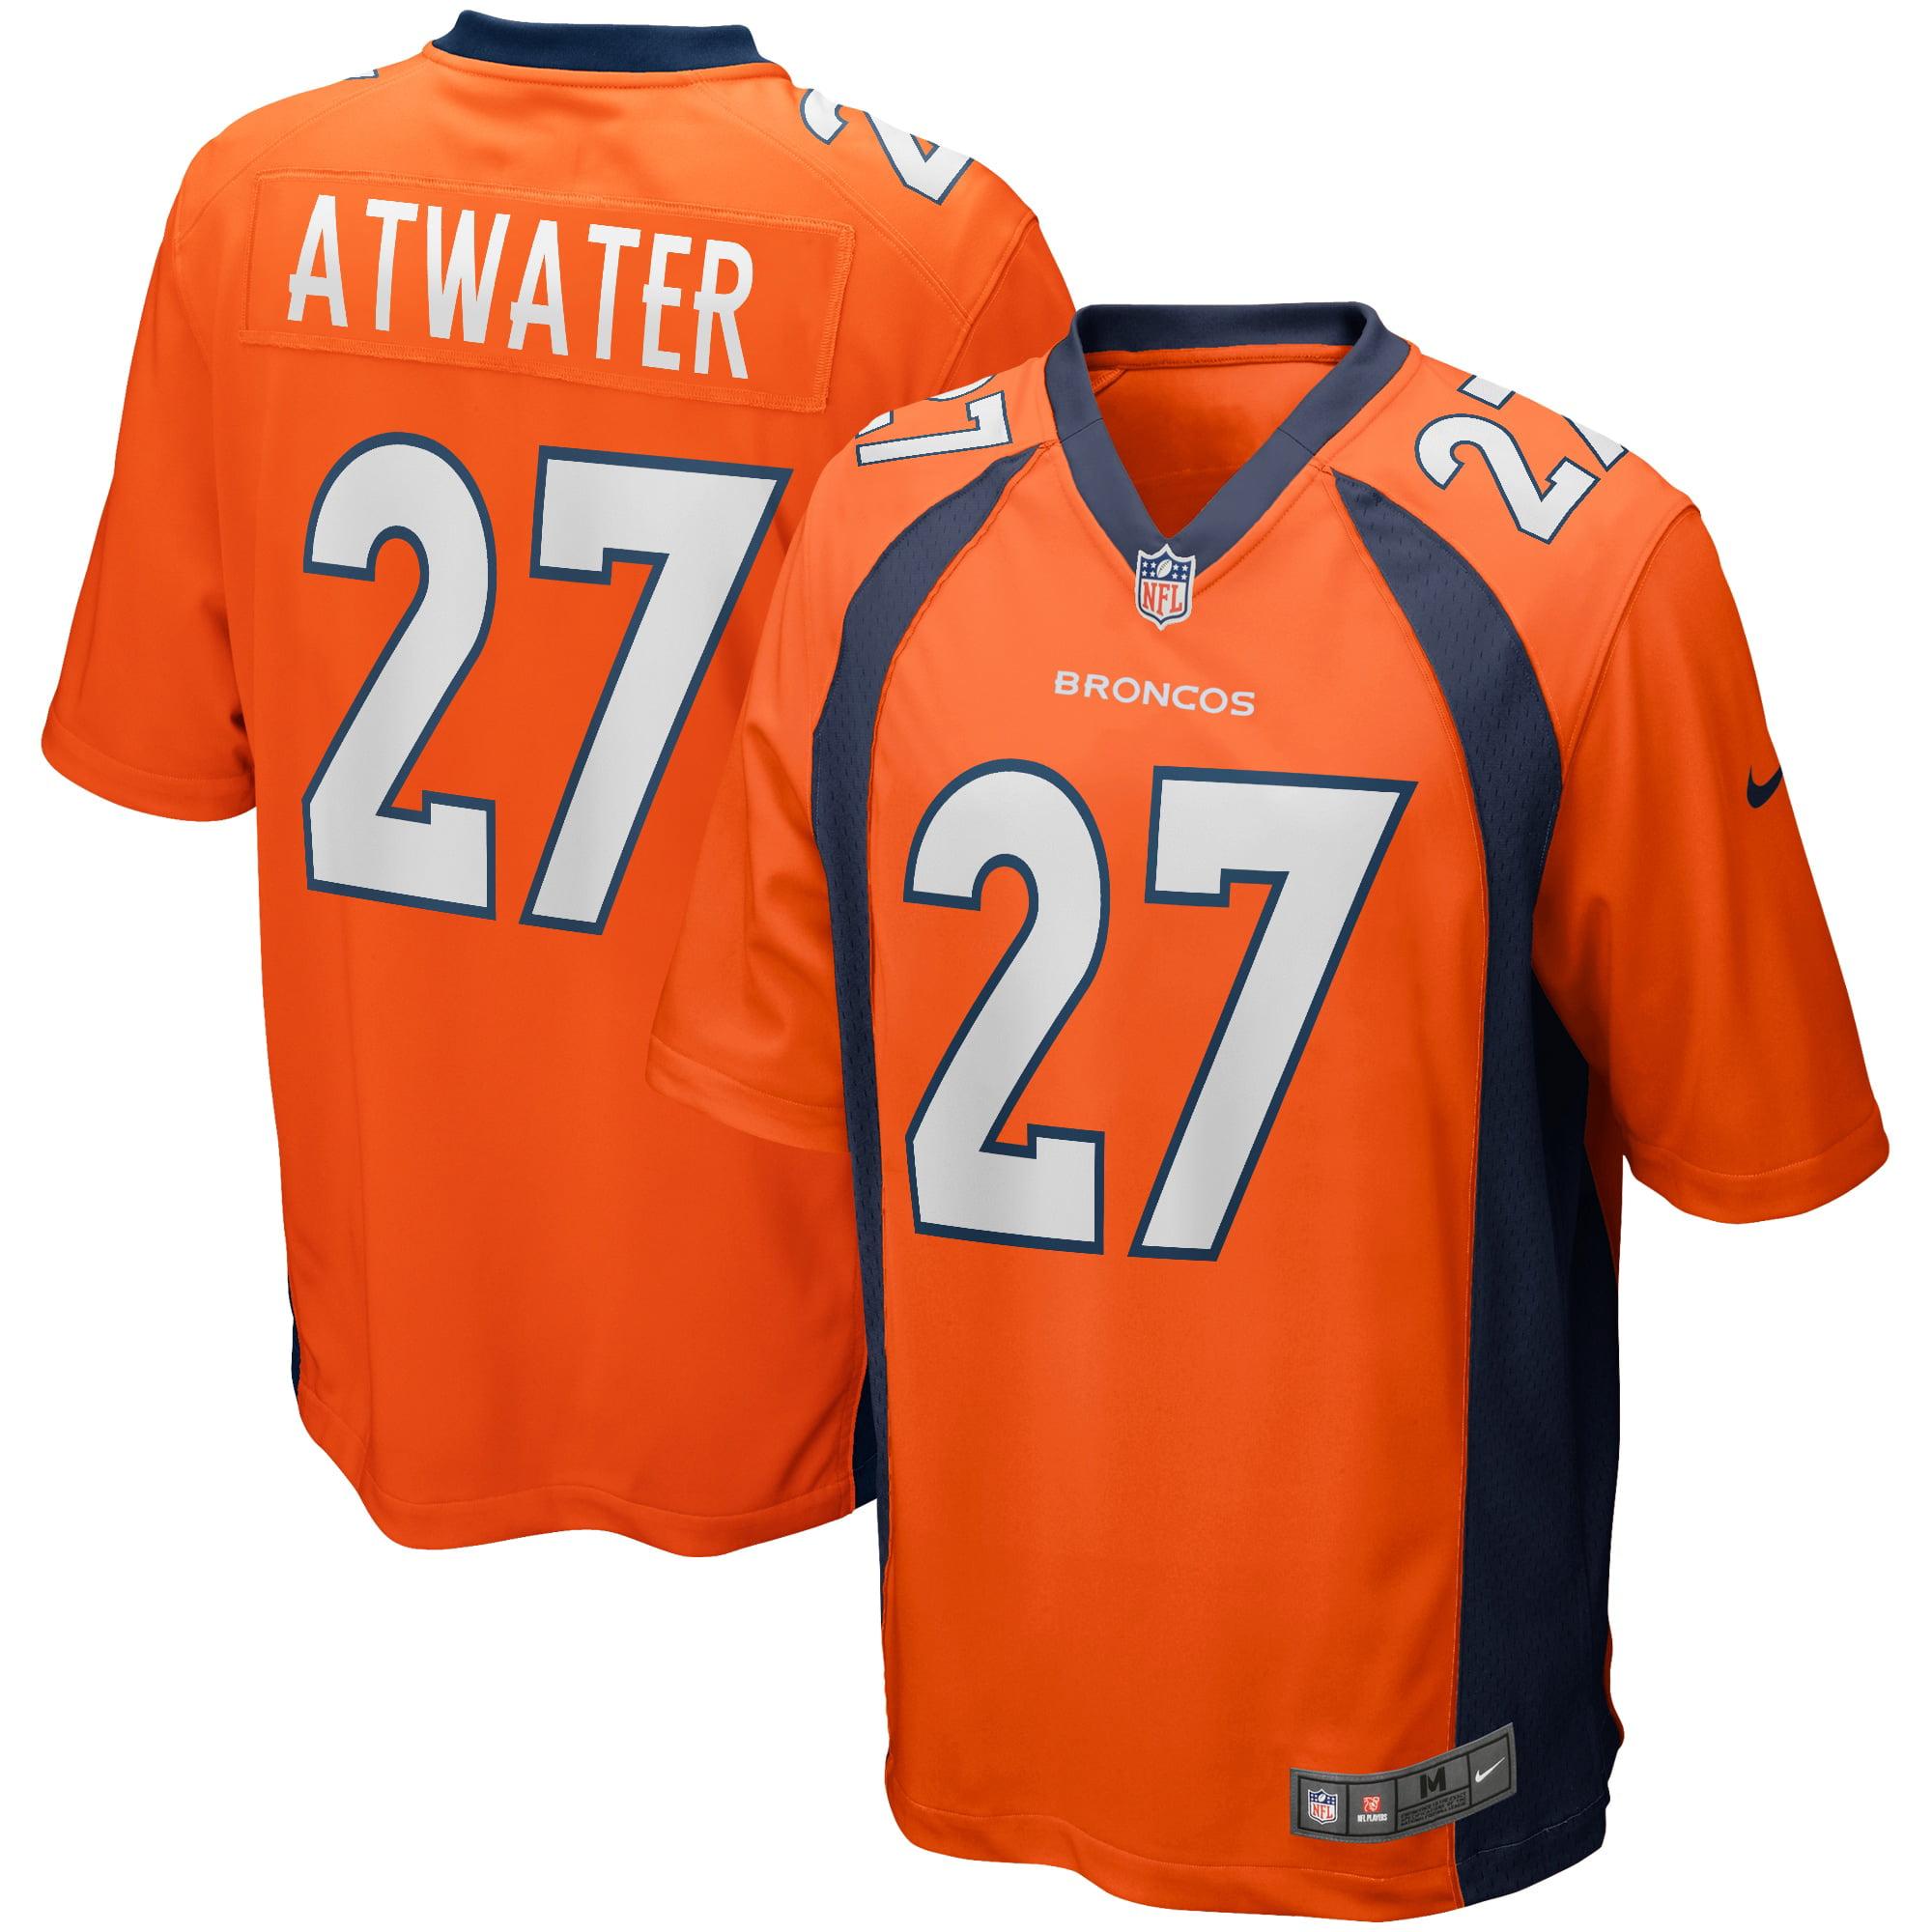 Steve Atwater Denver Broncos Nike Game Retired Player Jersey - Orange - Walmart.com